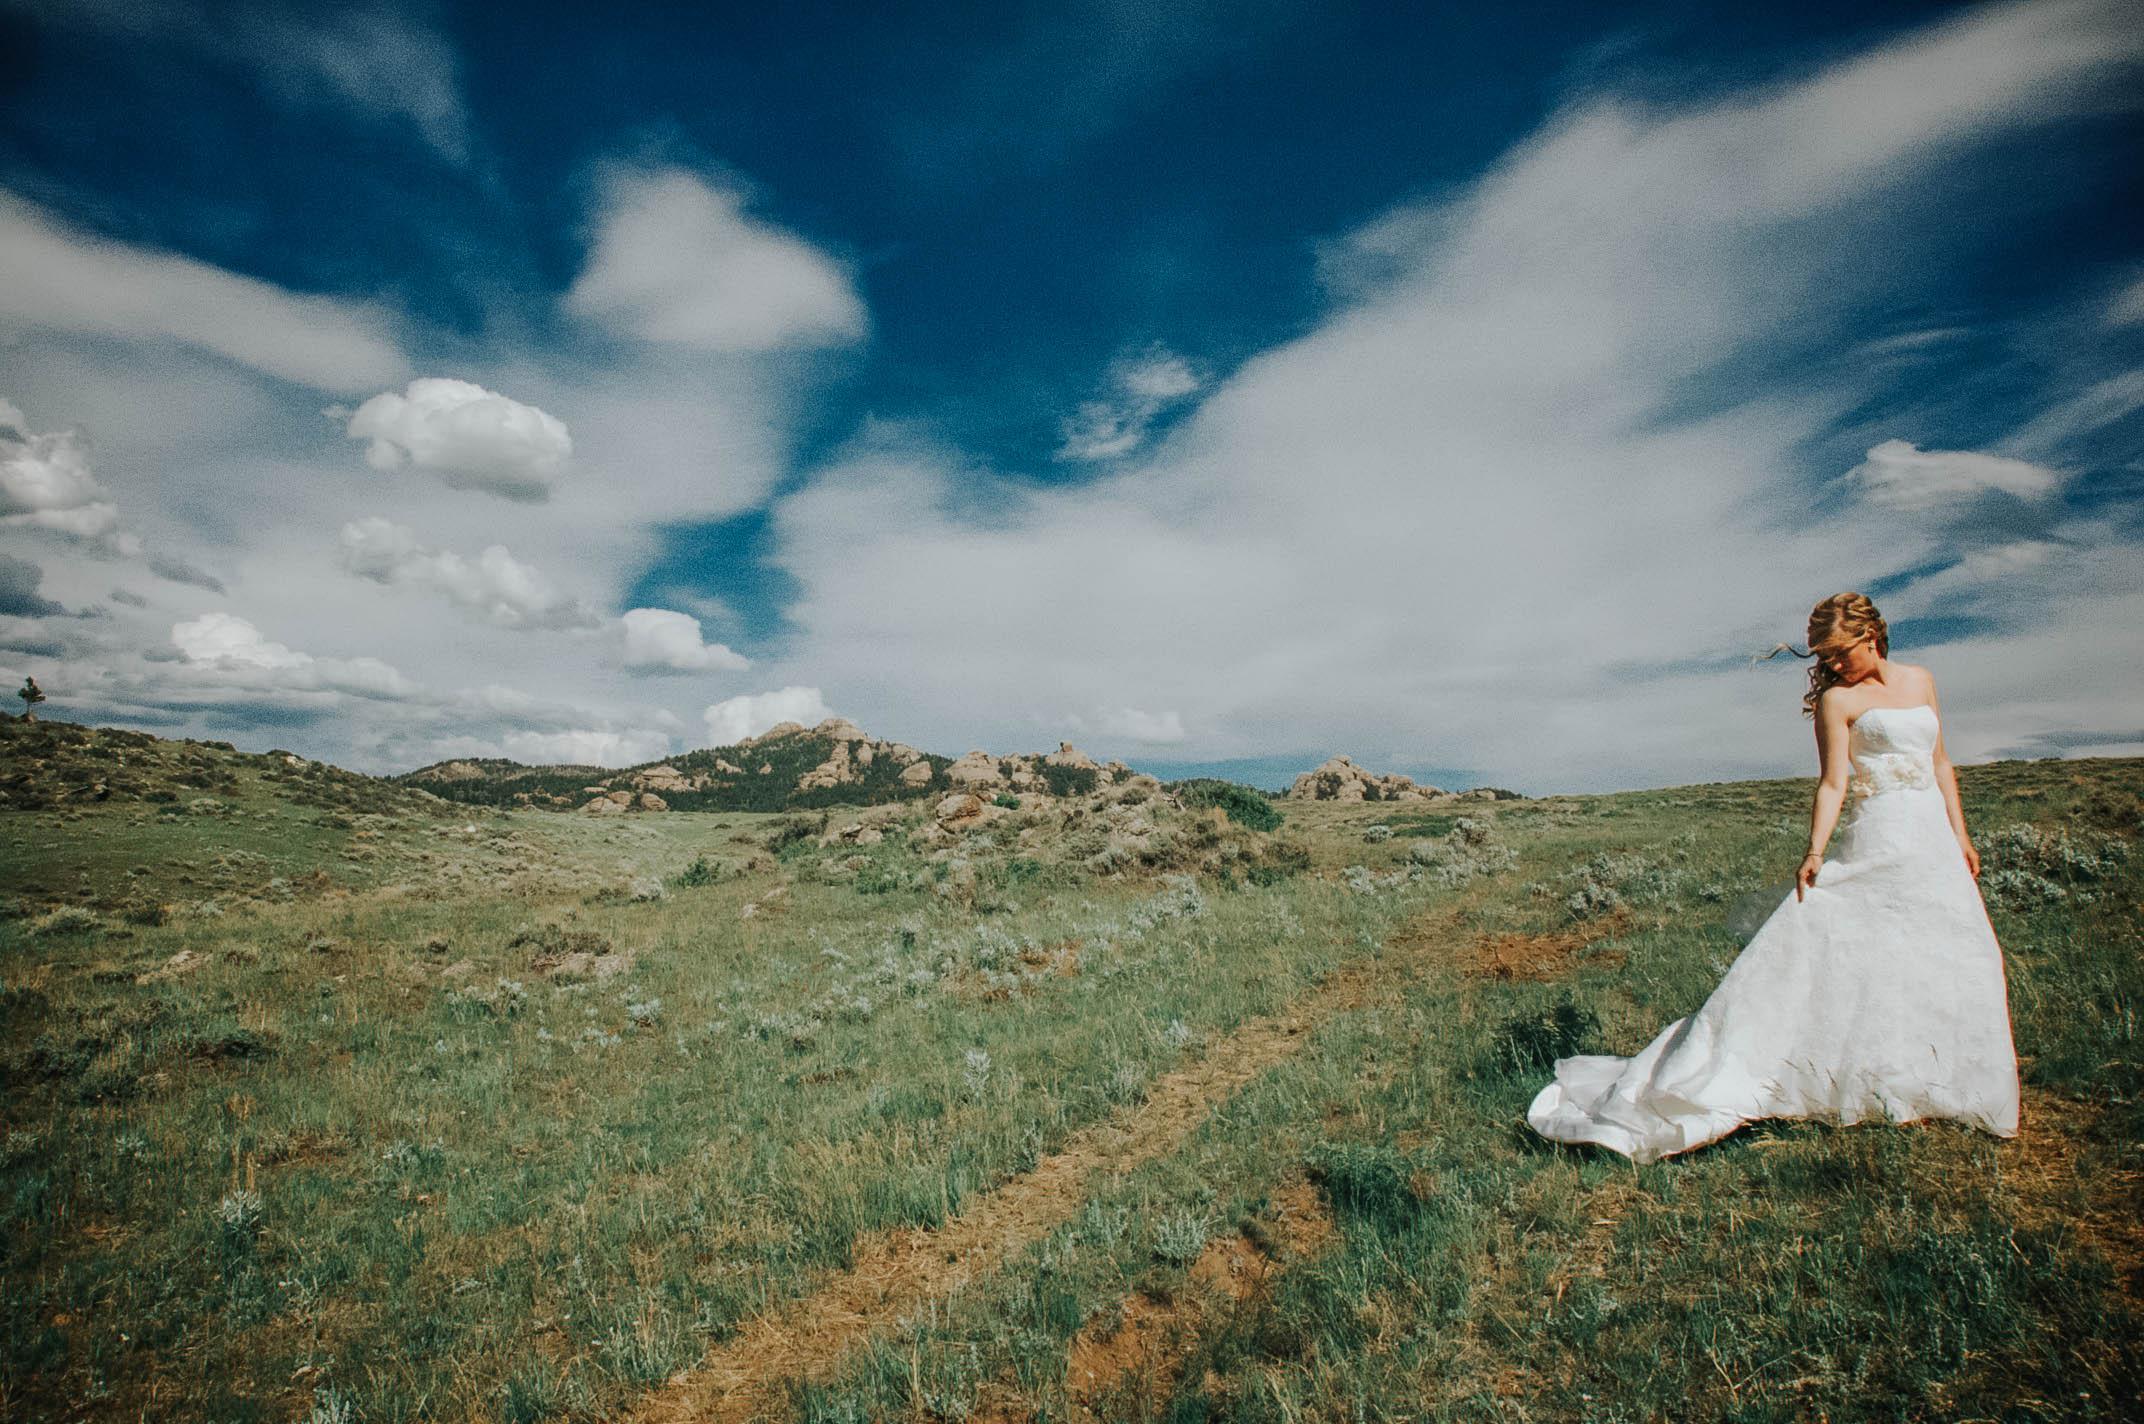 Whidbey-Island-Wedding-Photographer-J-Hodges (2 of 8)-2.jpg